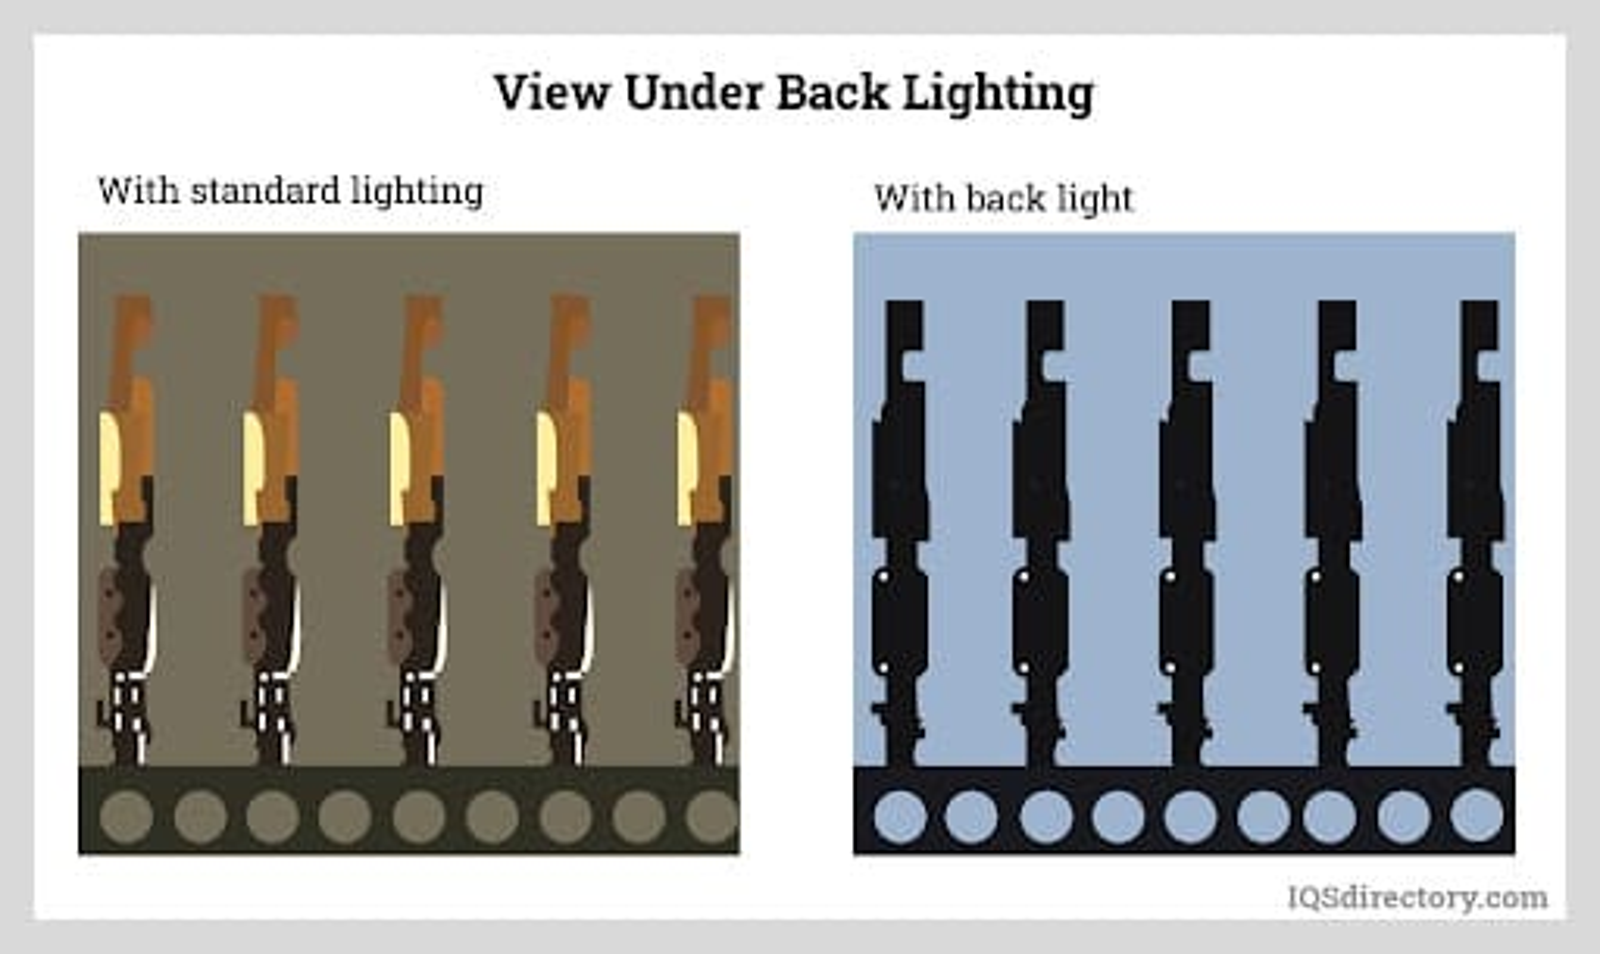 View Under Back Lighting